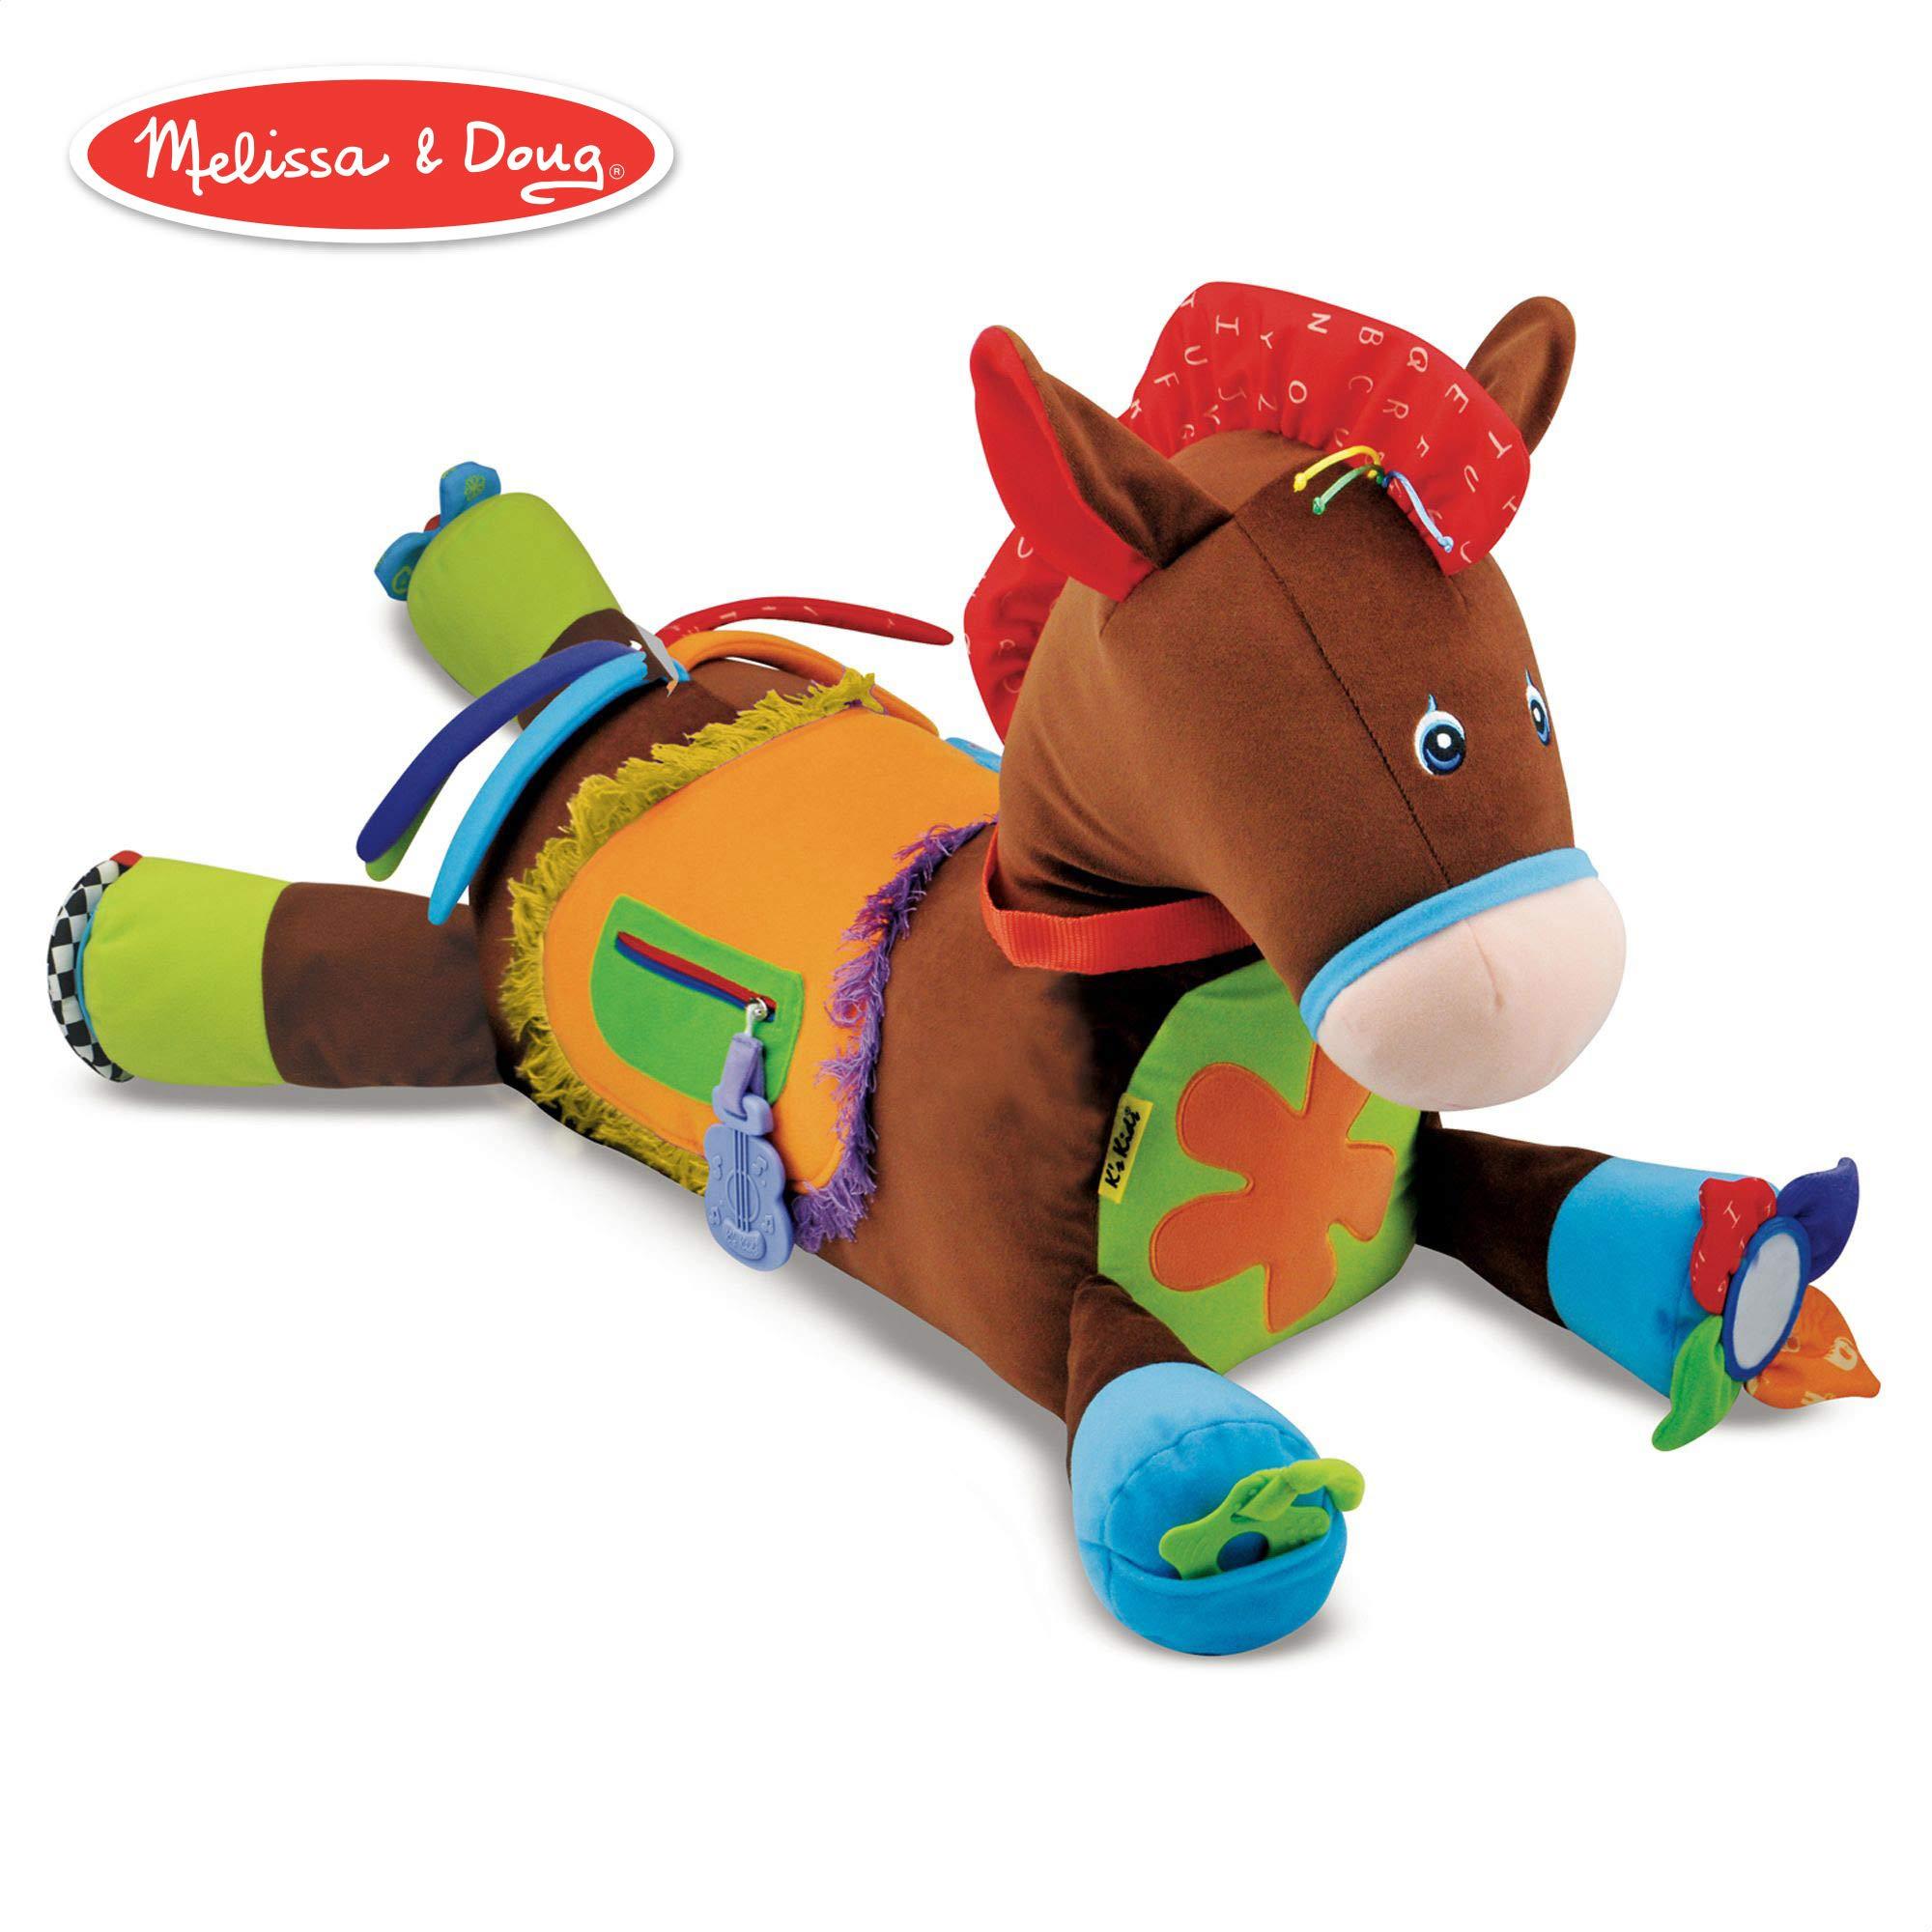 Melissa & Doug Giddy-Up & Play Baby Activity Toy (Multi-Sensory Horse)